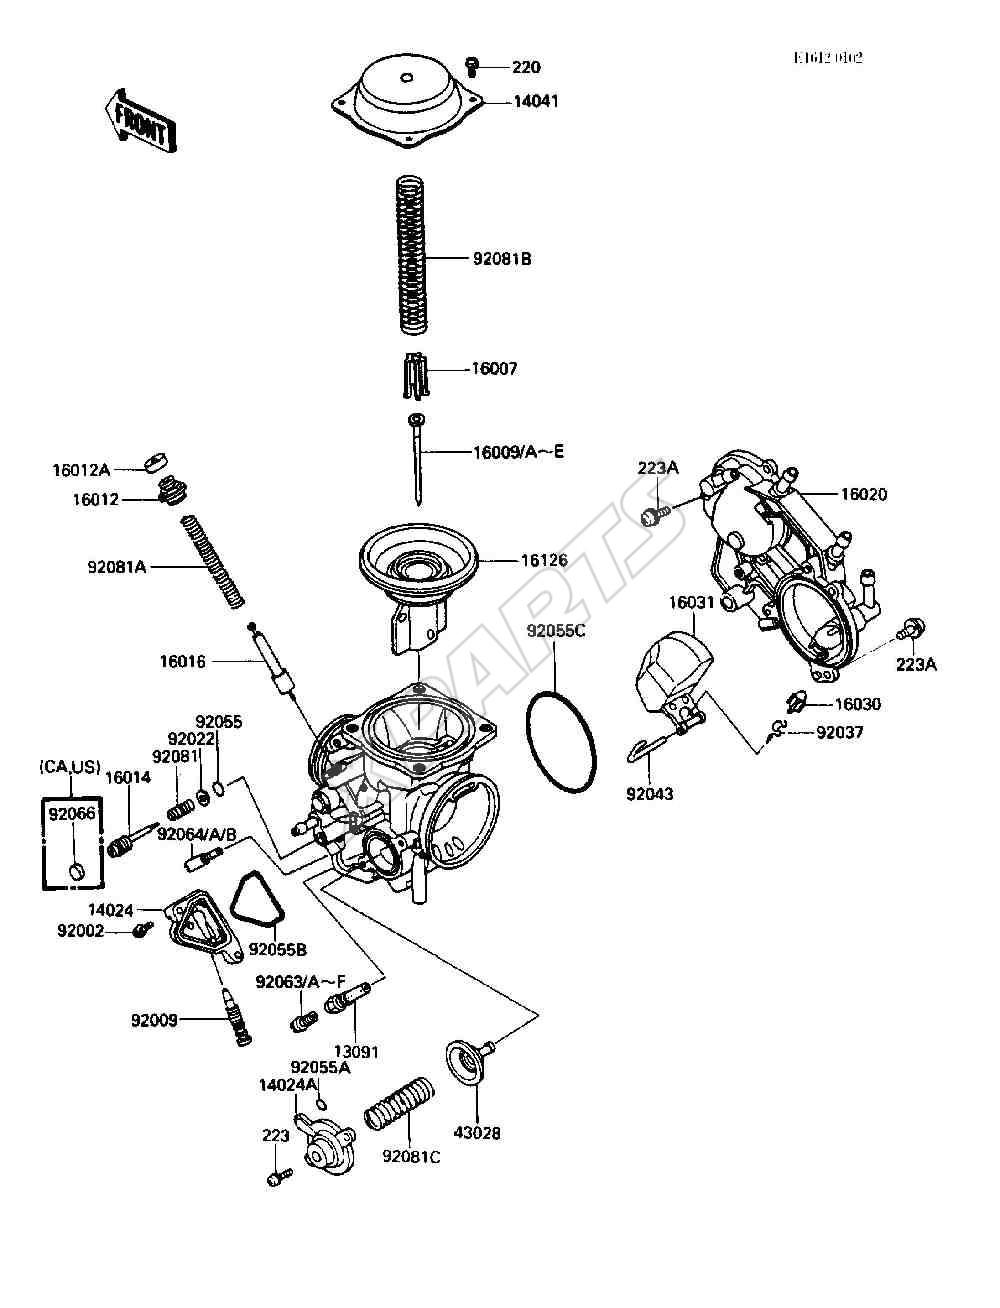 Kawasaki vulcan 750 vn750 a2 fra 1986 originale reservedele fra 49198488 1986 vulcan 750 vn750 a2 kawasaki vulcan 750 engine diagram